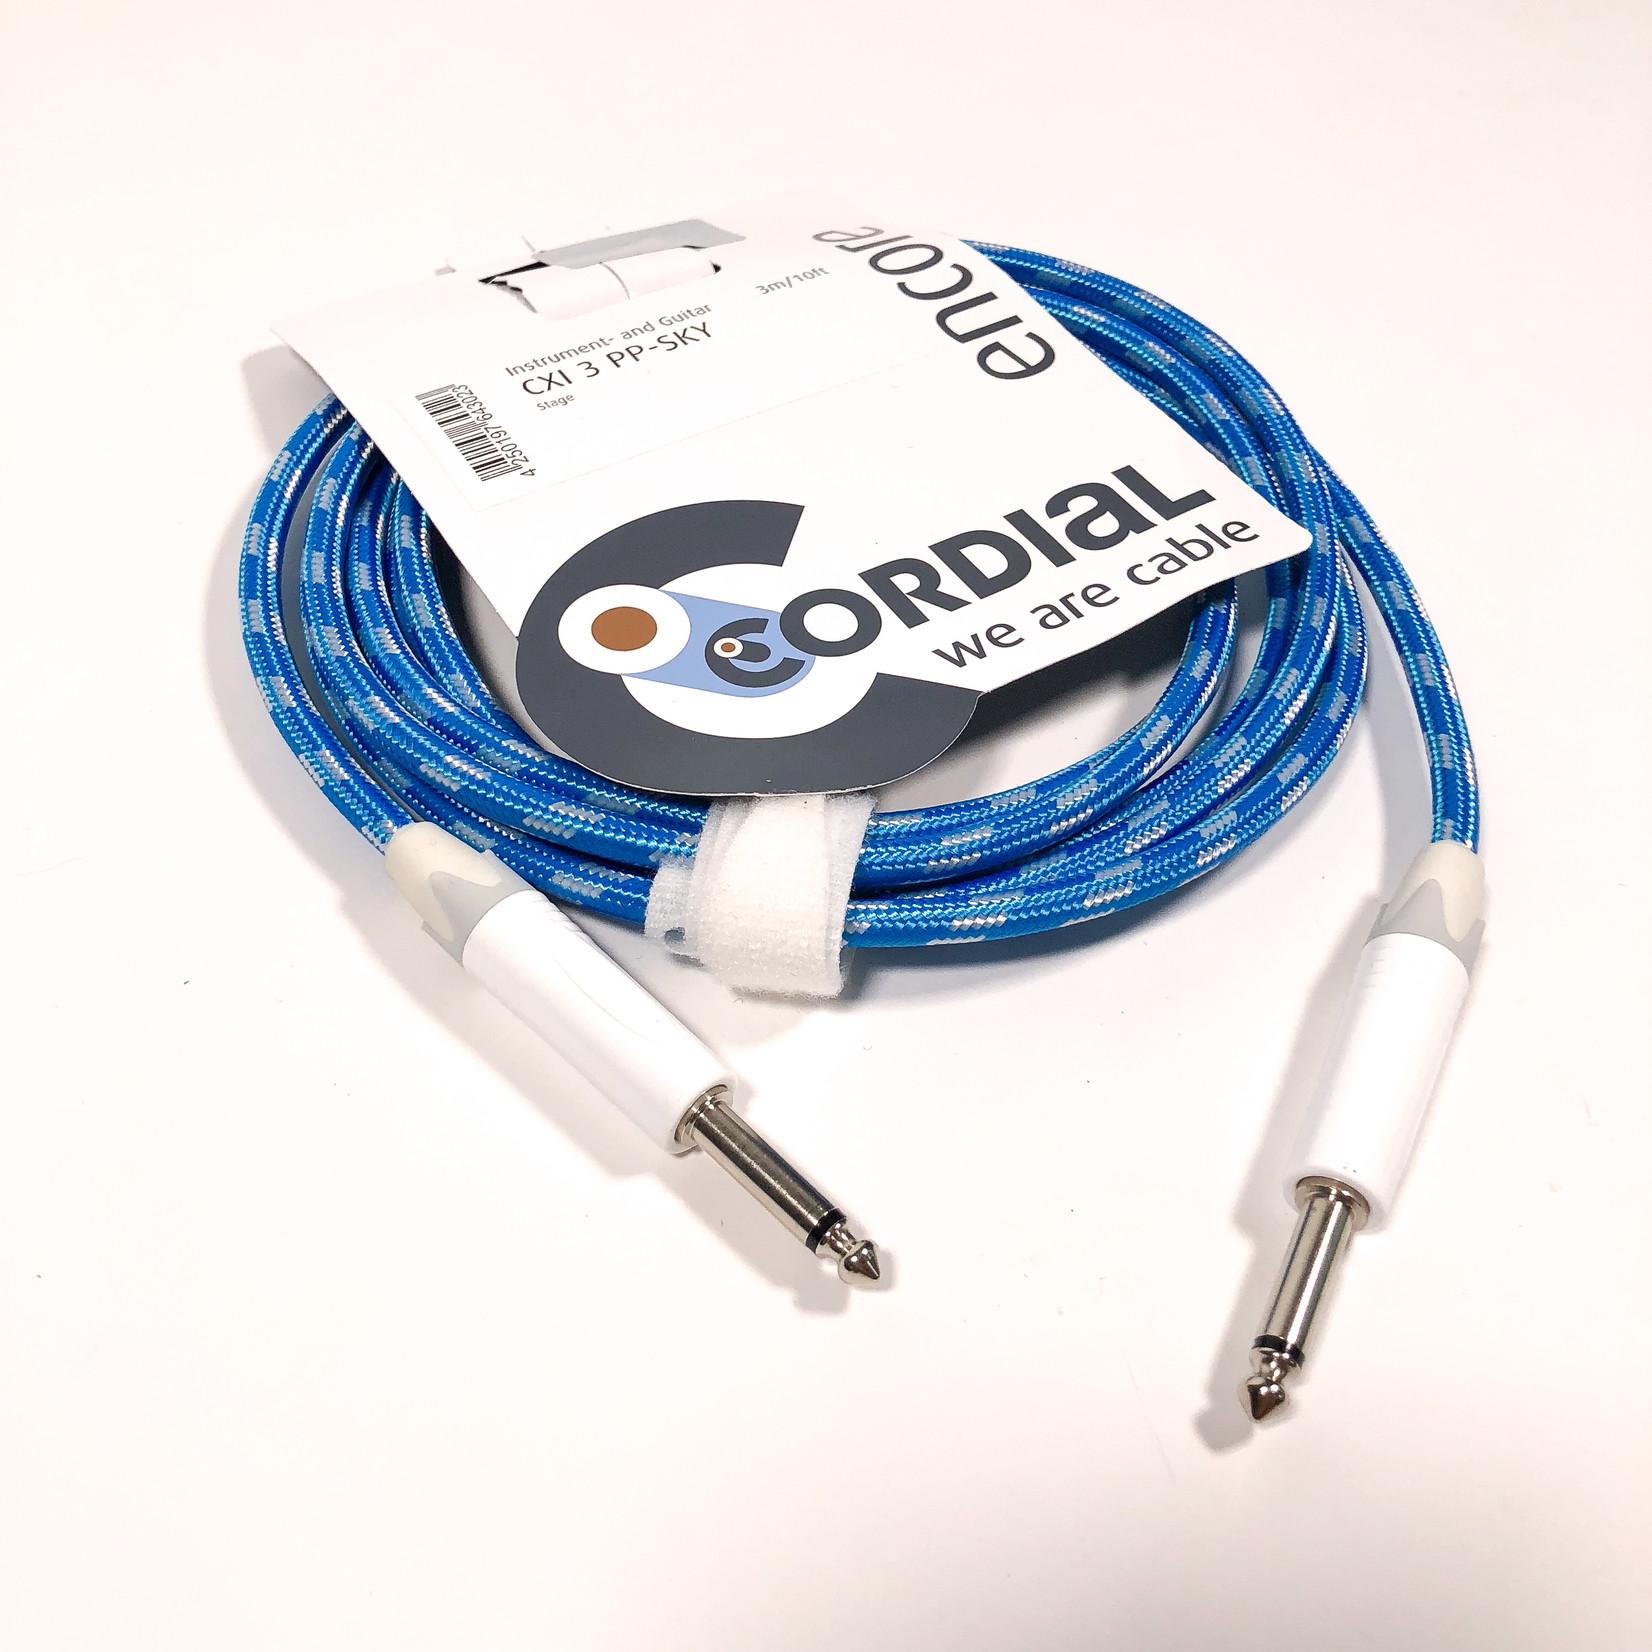 Cordial Cables Cordial 3m /~10ft Instrument Cable for Stage, 1/4'' Neutrik NP2 Connectors, CXI 3 PP-SKY (Germany)